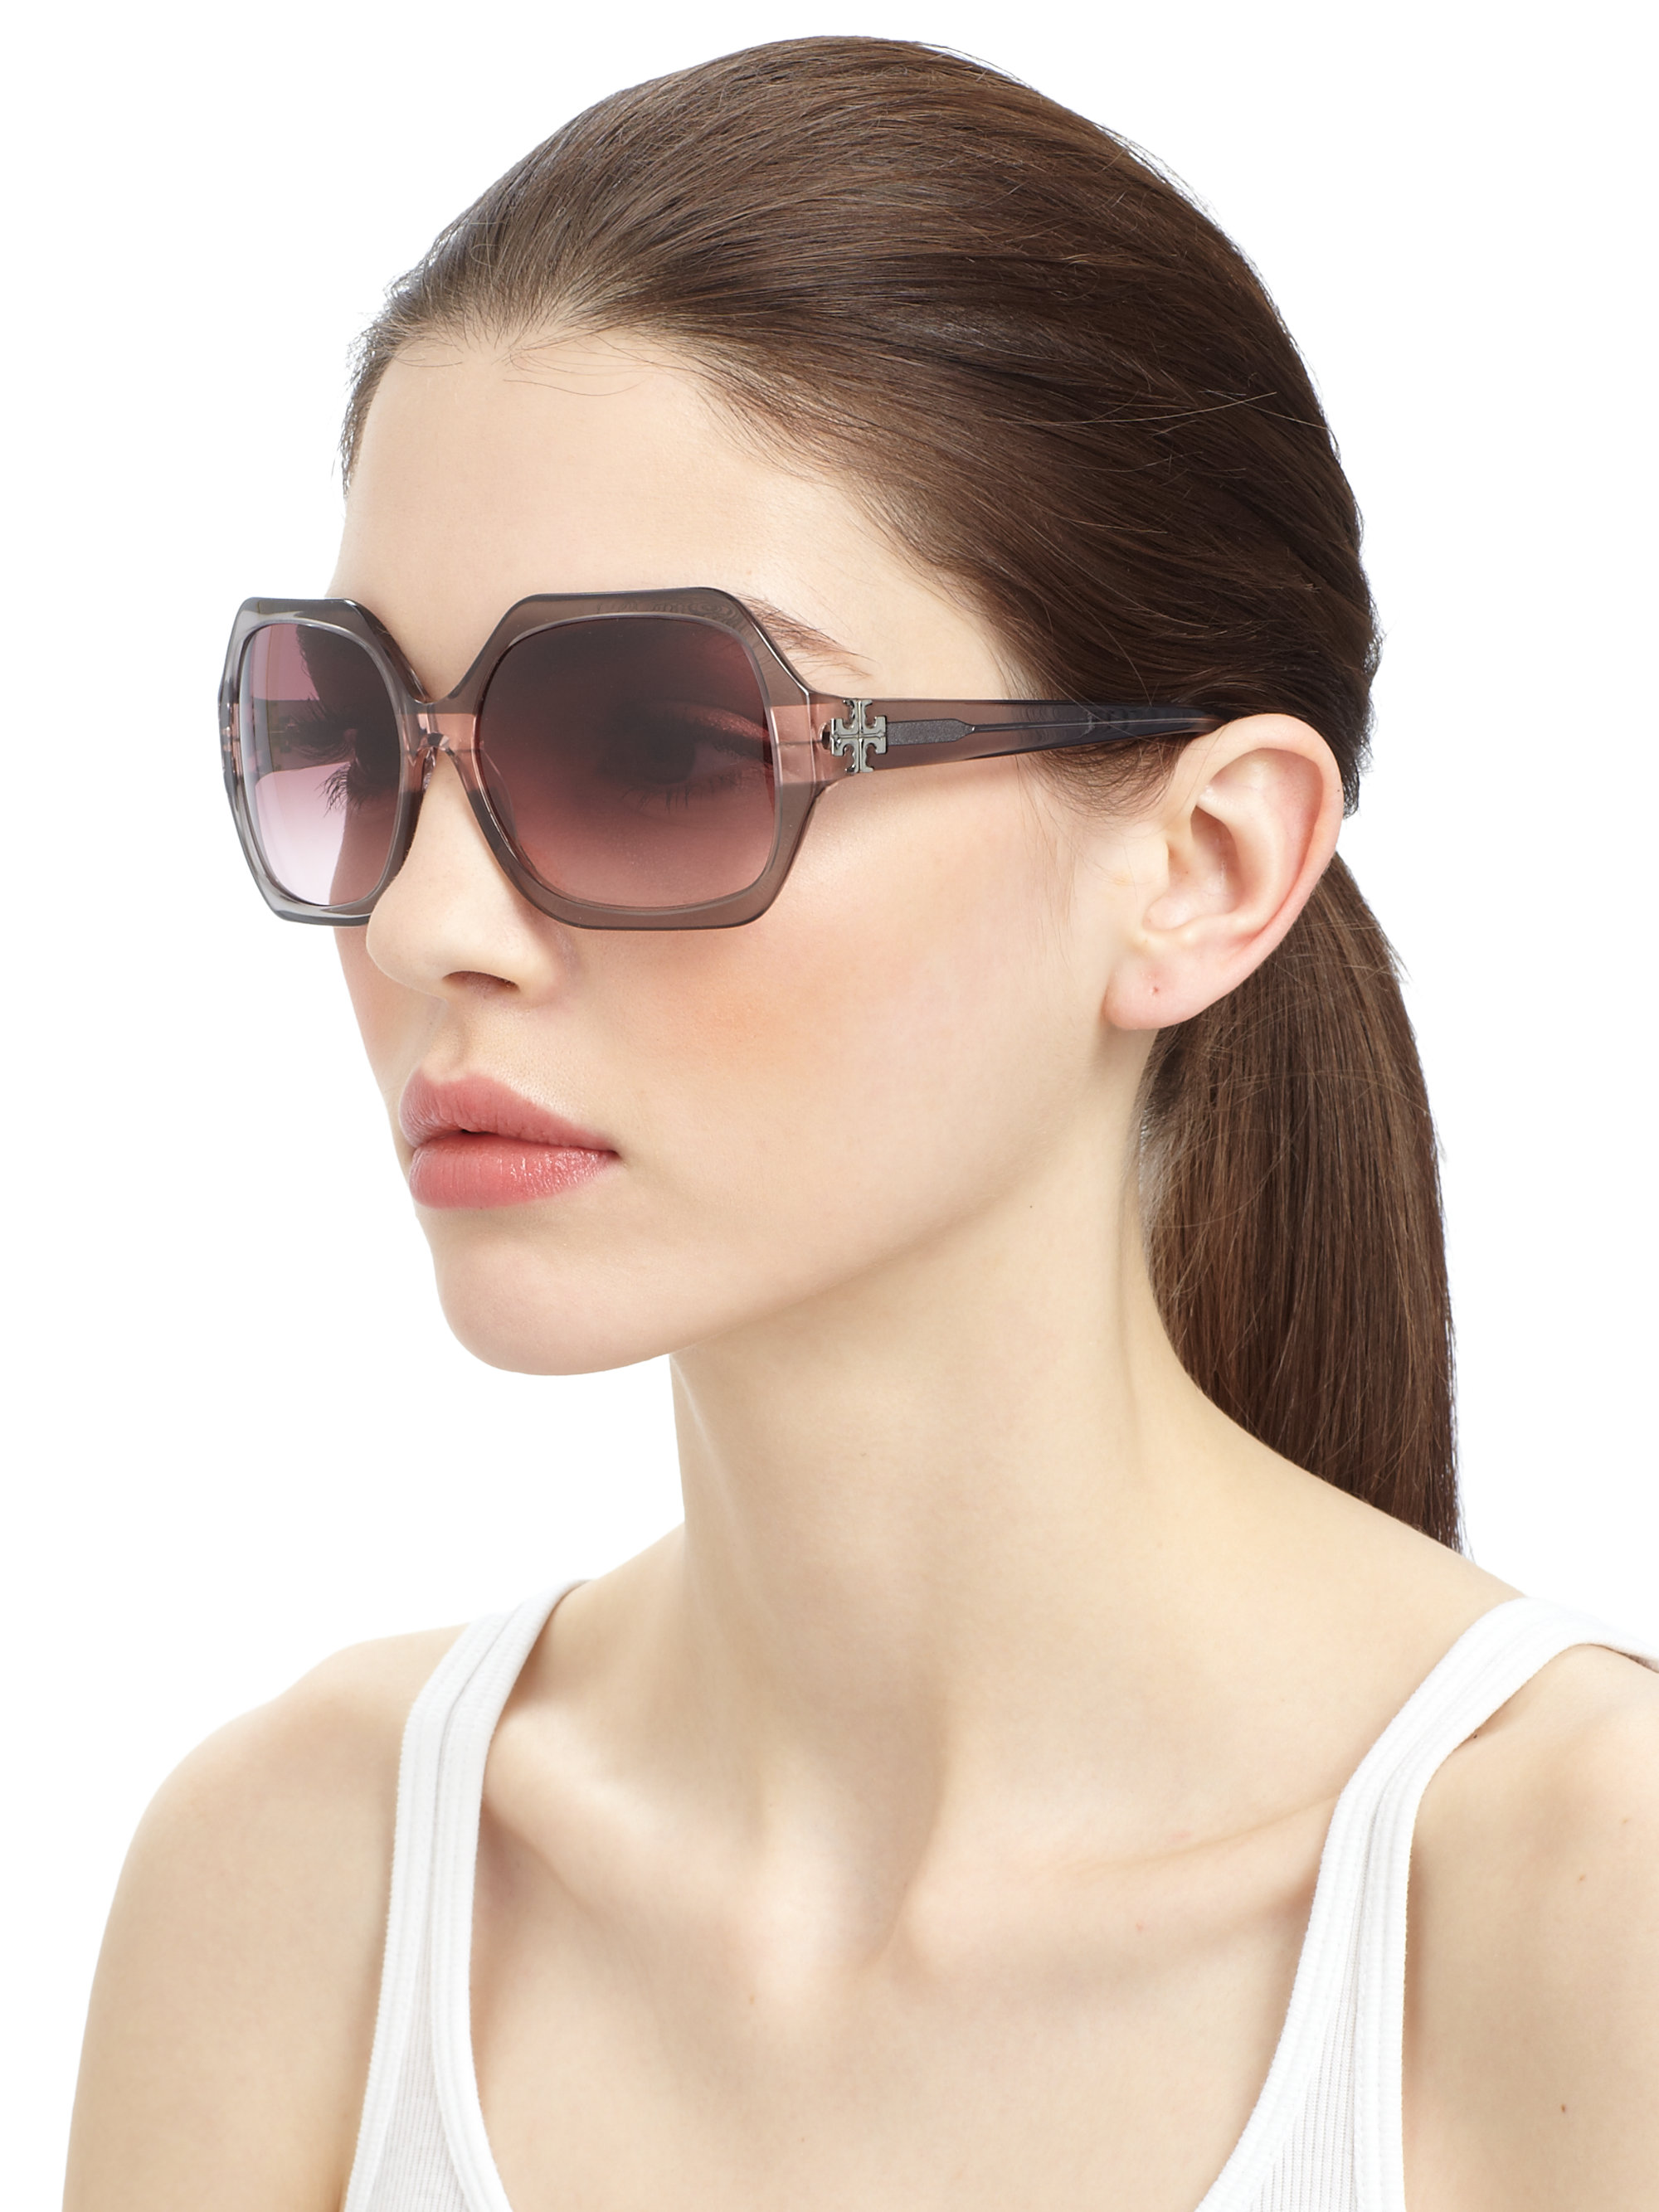 678743277c Lyst - Tory Burch Irregular Square Sunglasses in Gray